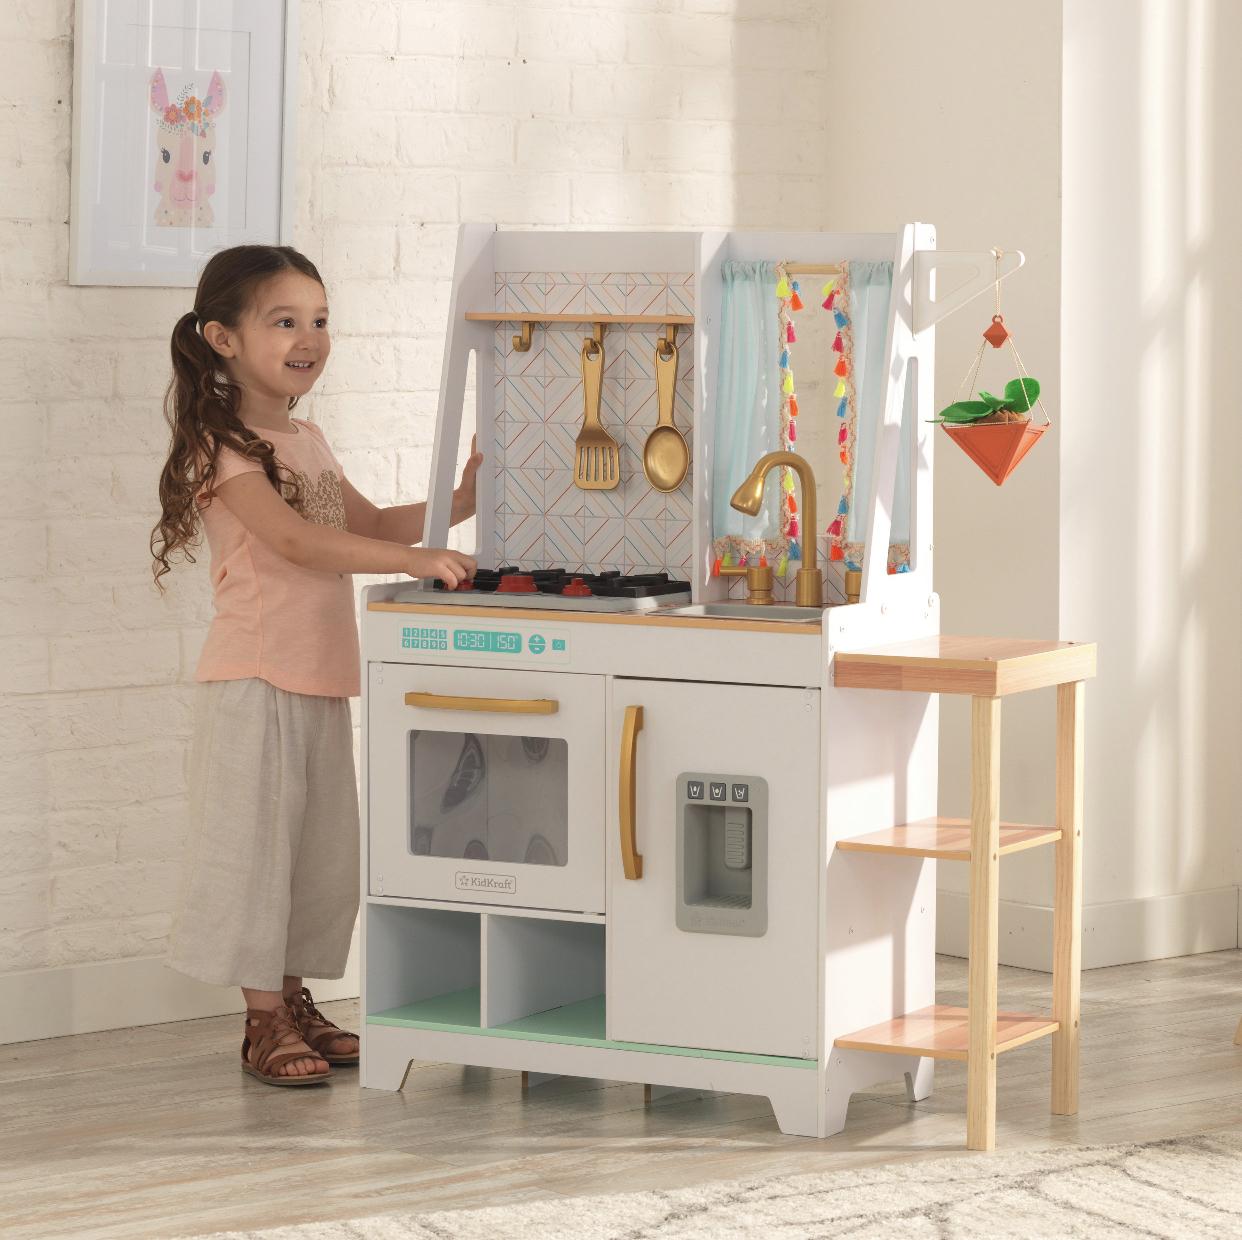 Kidkraft boho bungalow play kitchen -39.98 - ymmv $39.98